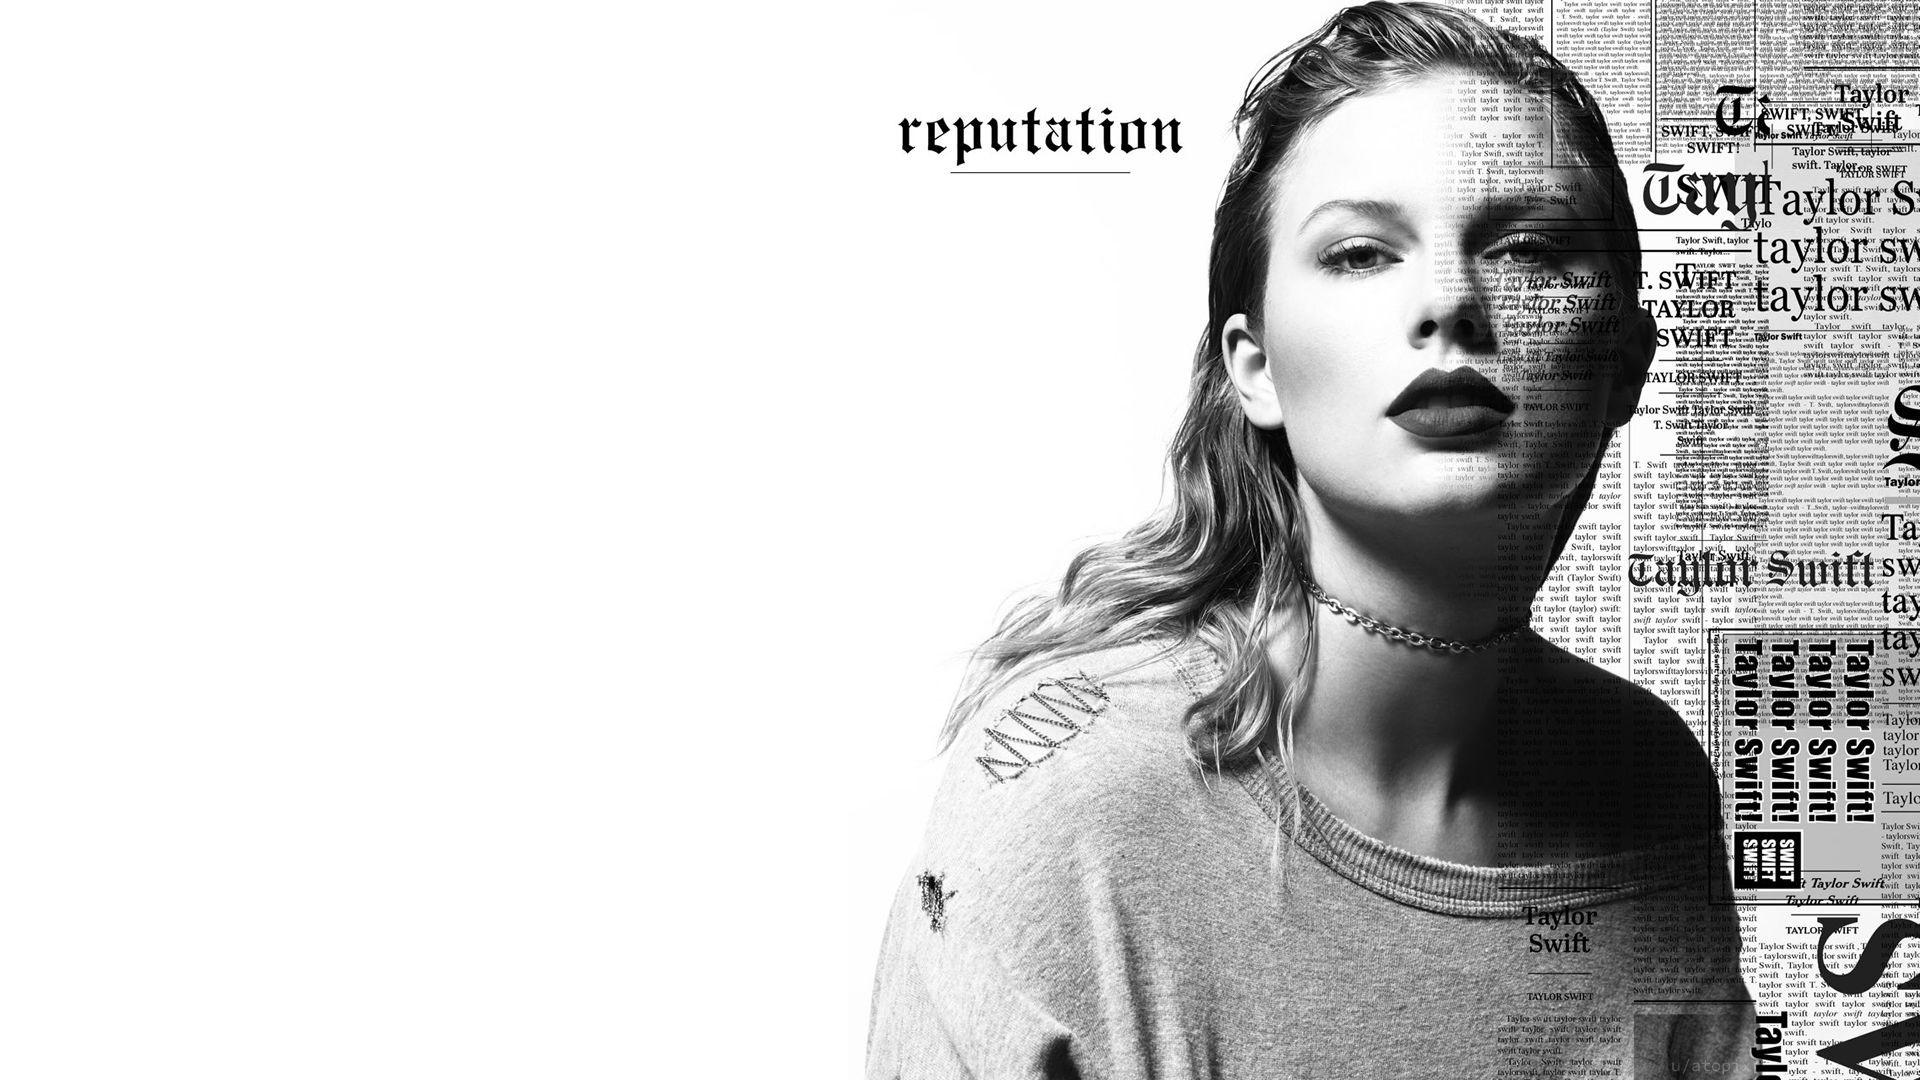 Taylor swift widescreen reputation slick hair